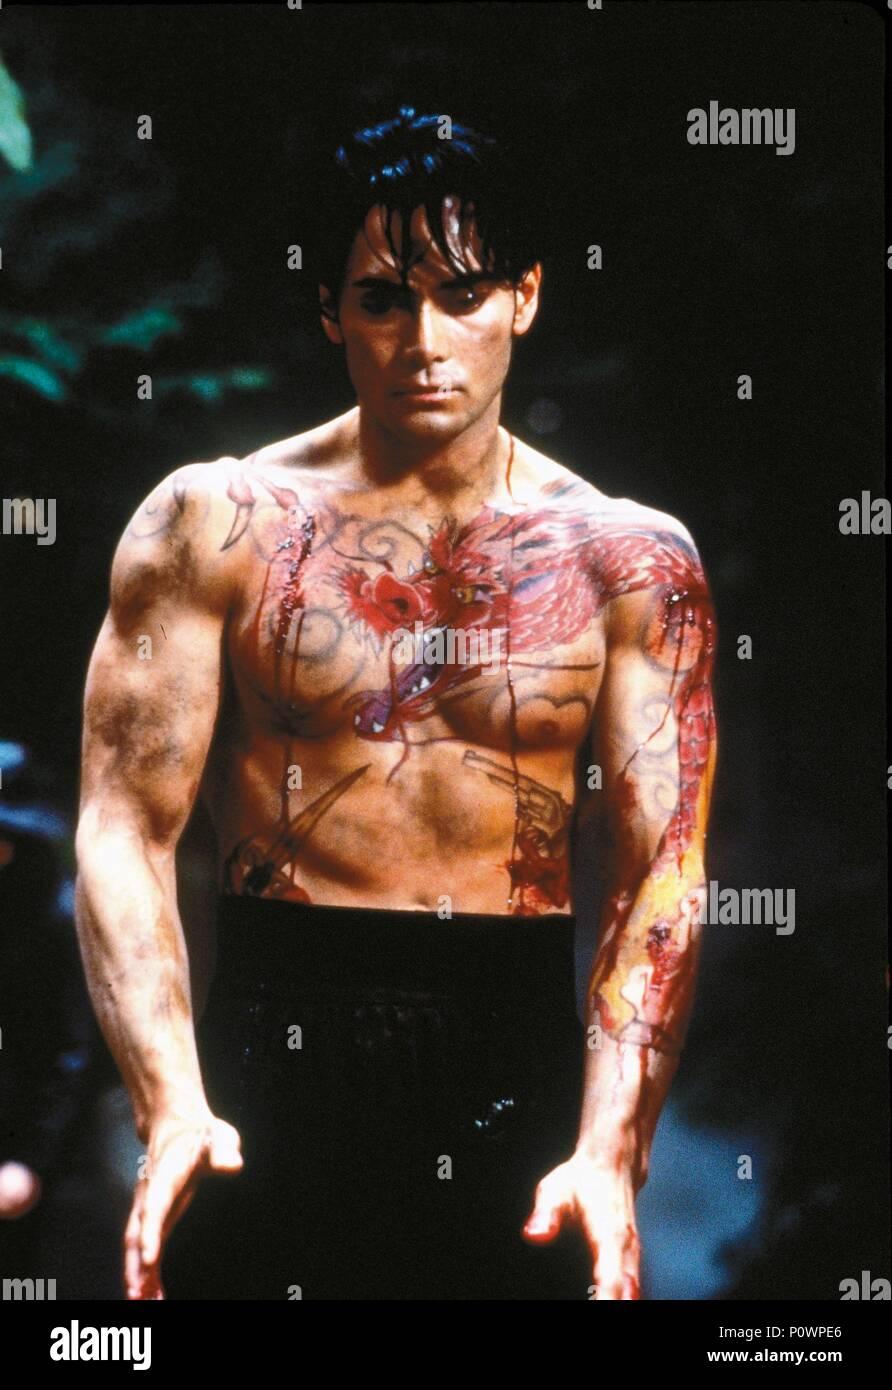 Crying Freeman (film) : crying, freeman, (film), Original, Title:, CRYING, FREEMAN., English, Director:, CHRISTOPHE, GANS., Year:, 1995., Stars:, DACASCOS., Credit:, AUGUST, ENTERTEINMENT/DAVIS-FILMS/YUZNA, FILMS/OZLA, PROD., Album, Stock, Photo, Alamy